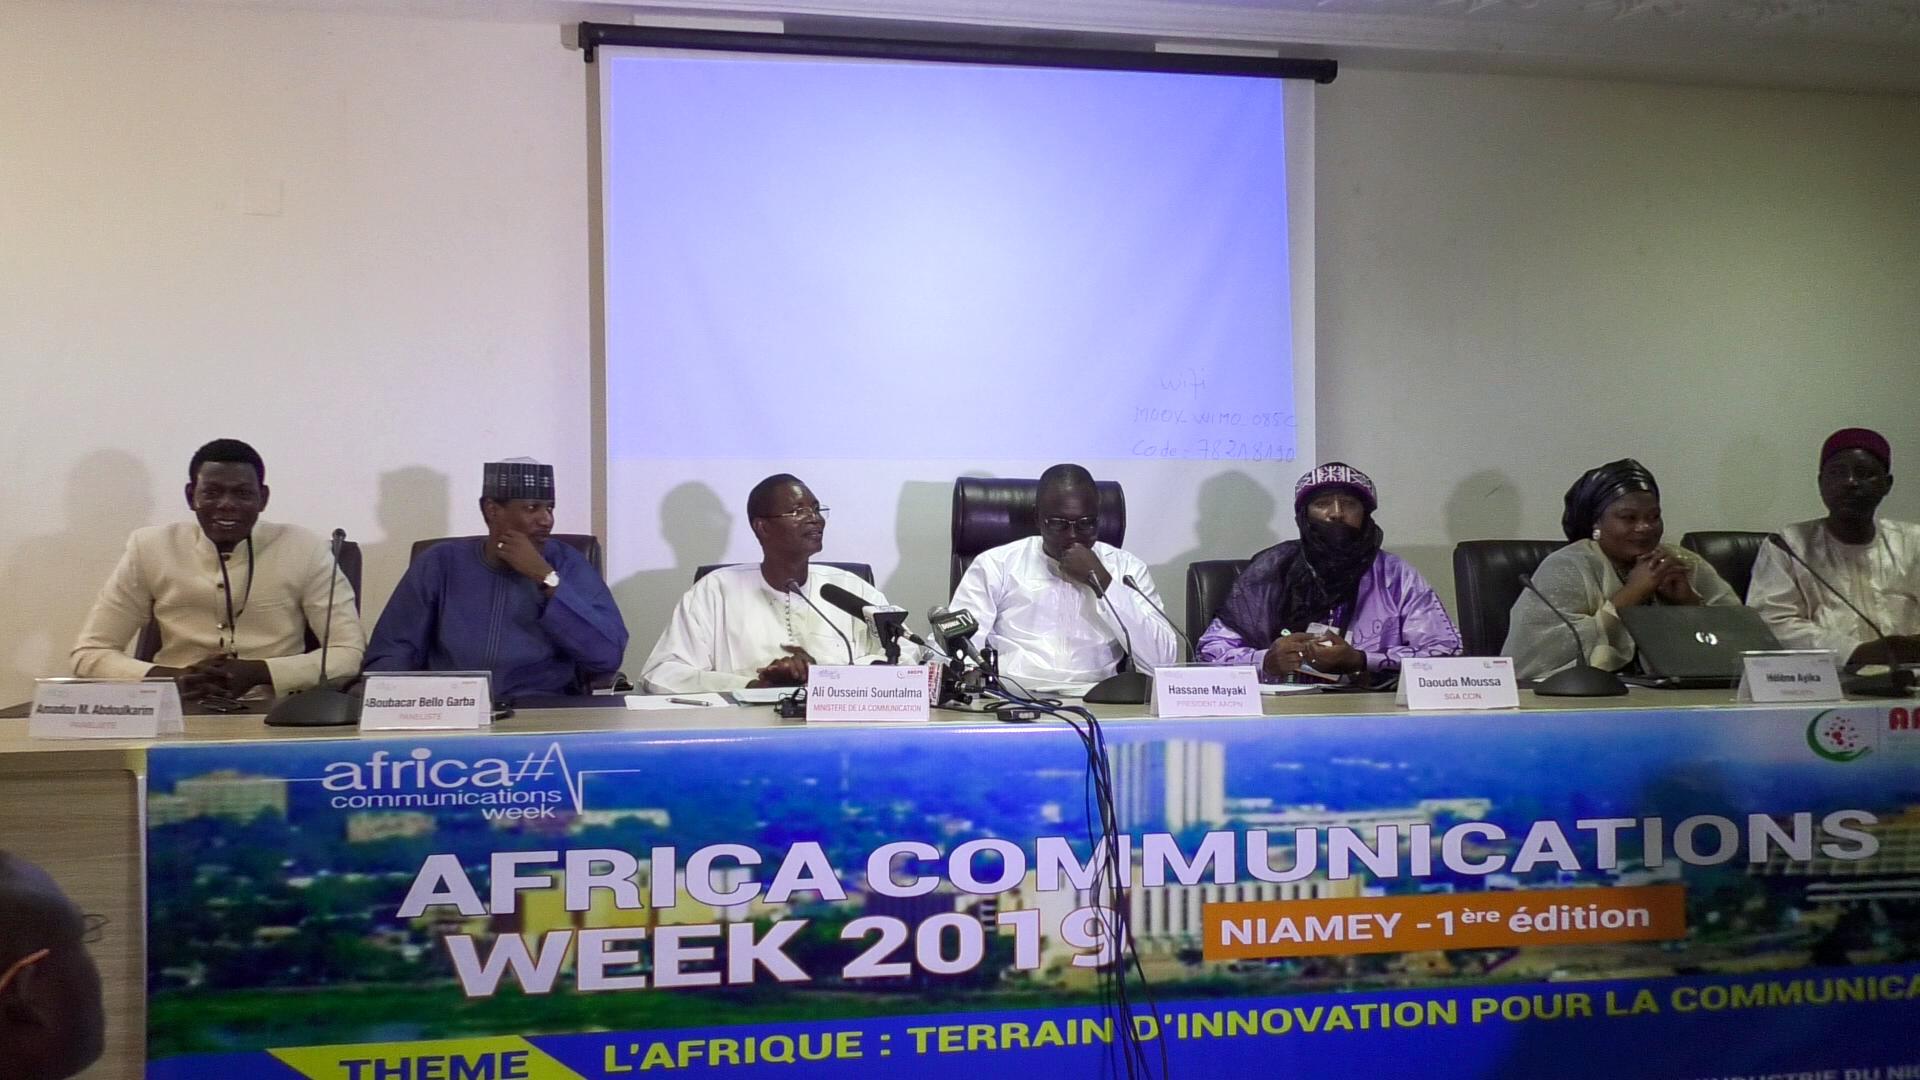 Africa Communications Week 2019